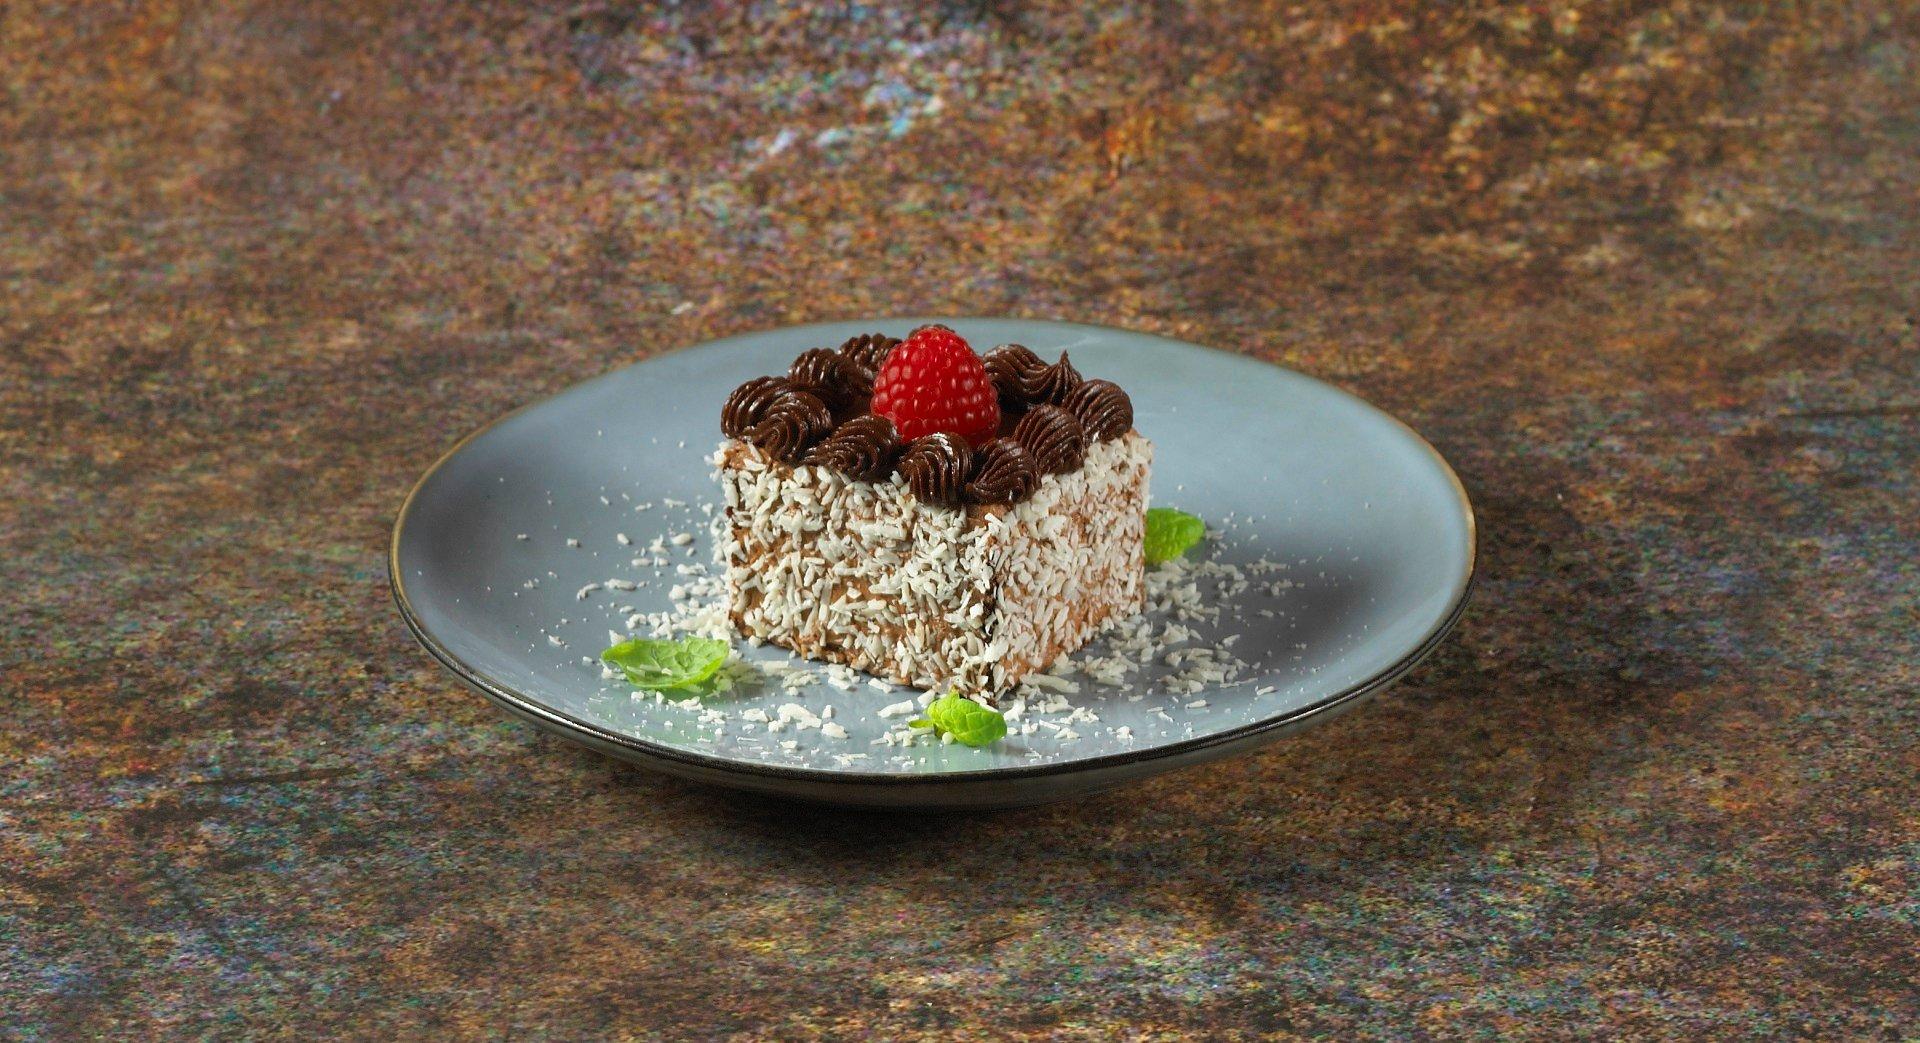 Sjokoladekake Med kokos 1920px